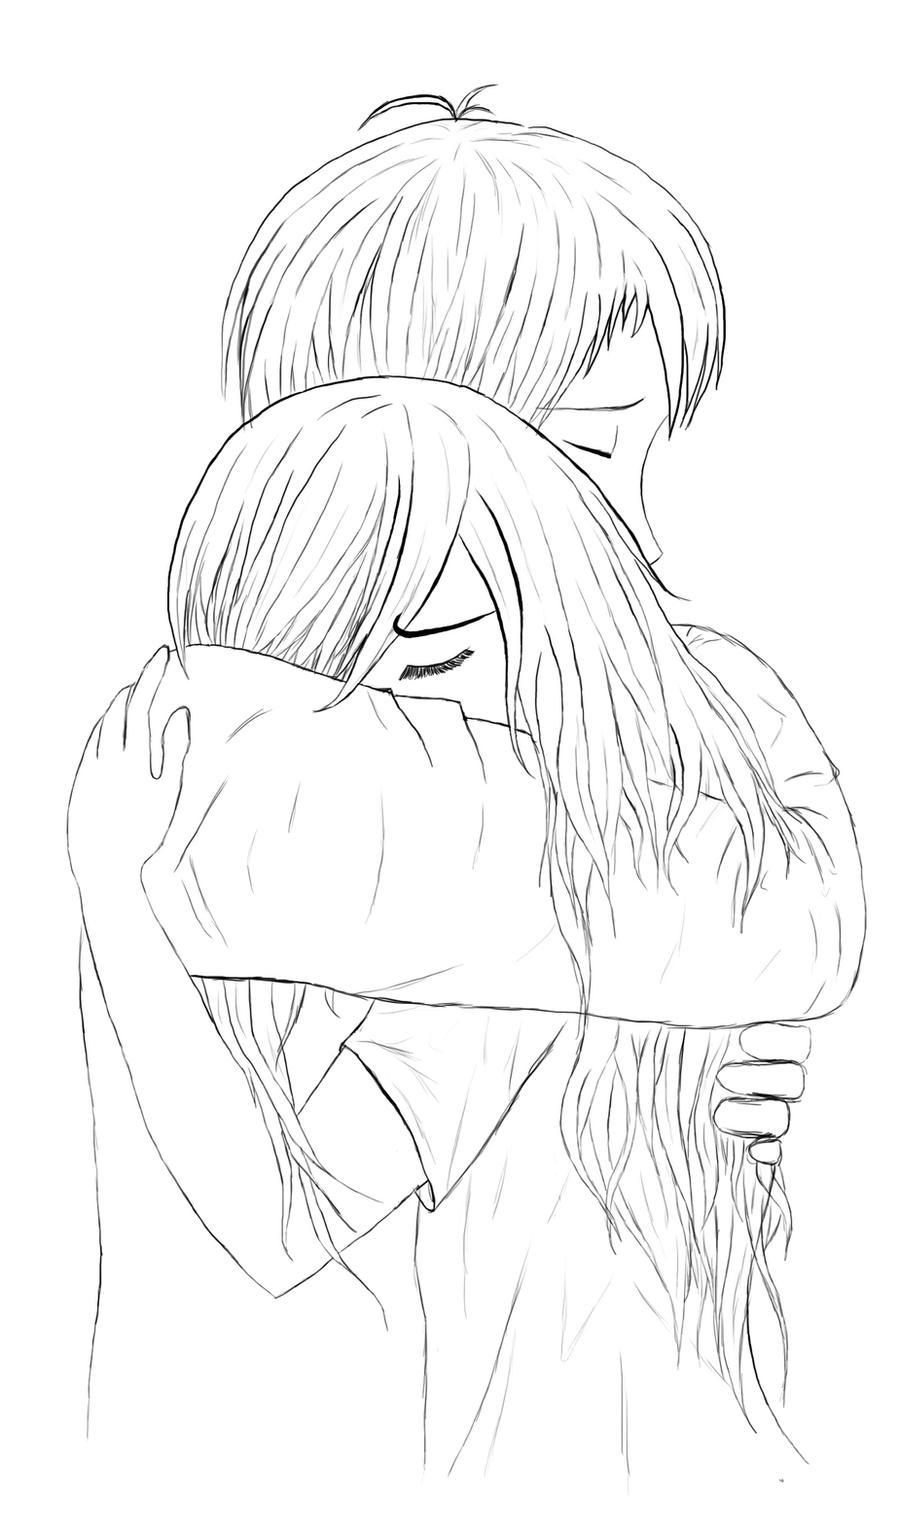 Hug lineart by Illsa on DeviantArt